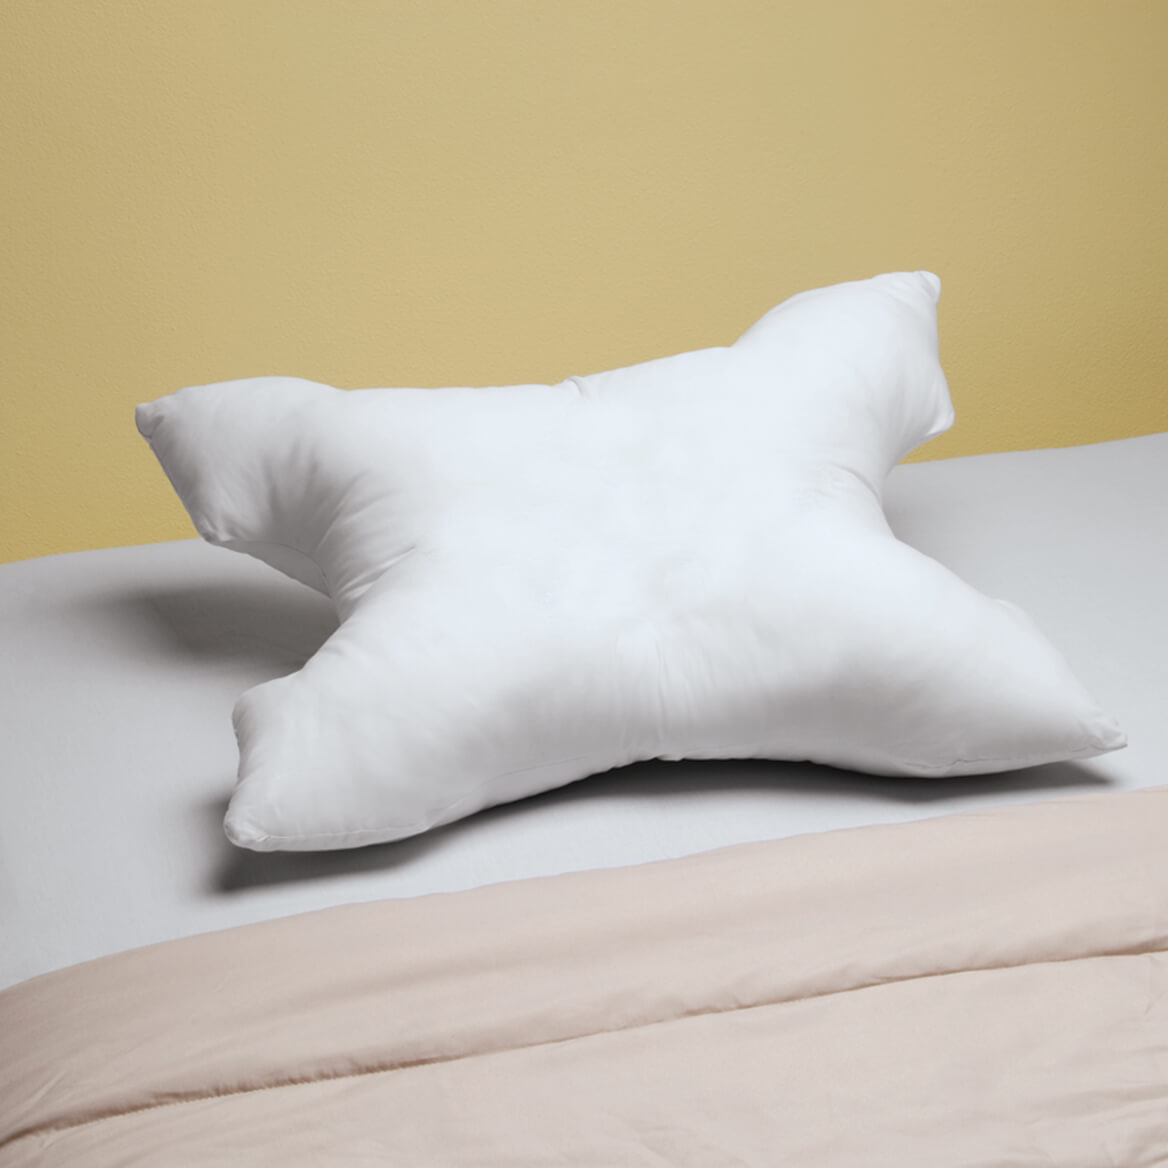 C-PAP Sleep Apnea Pillow and Case-331276